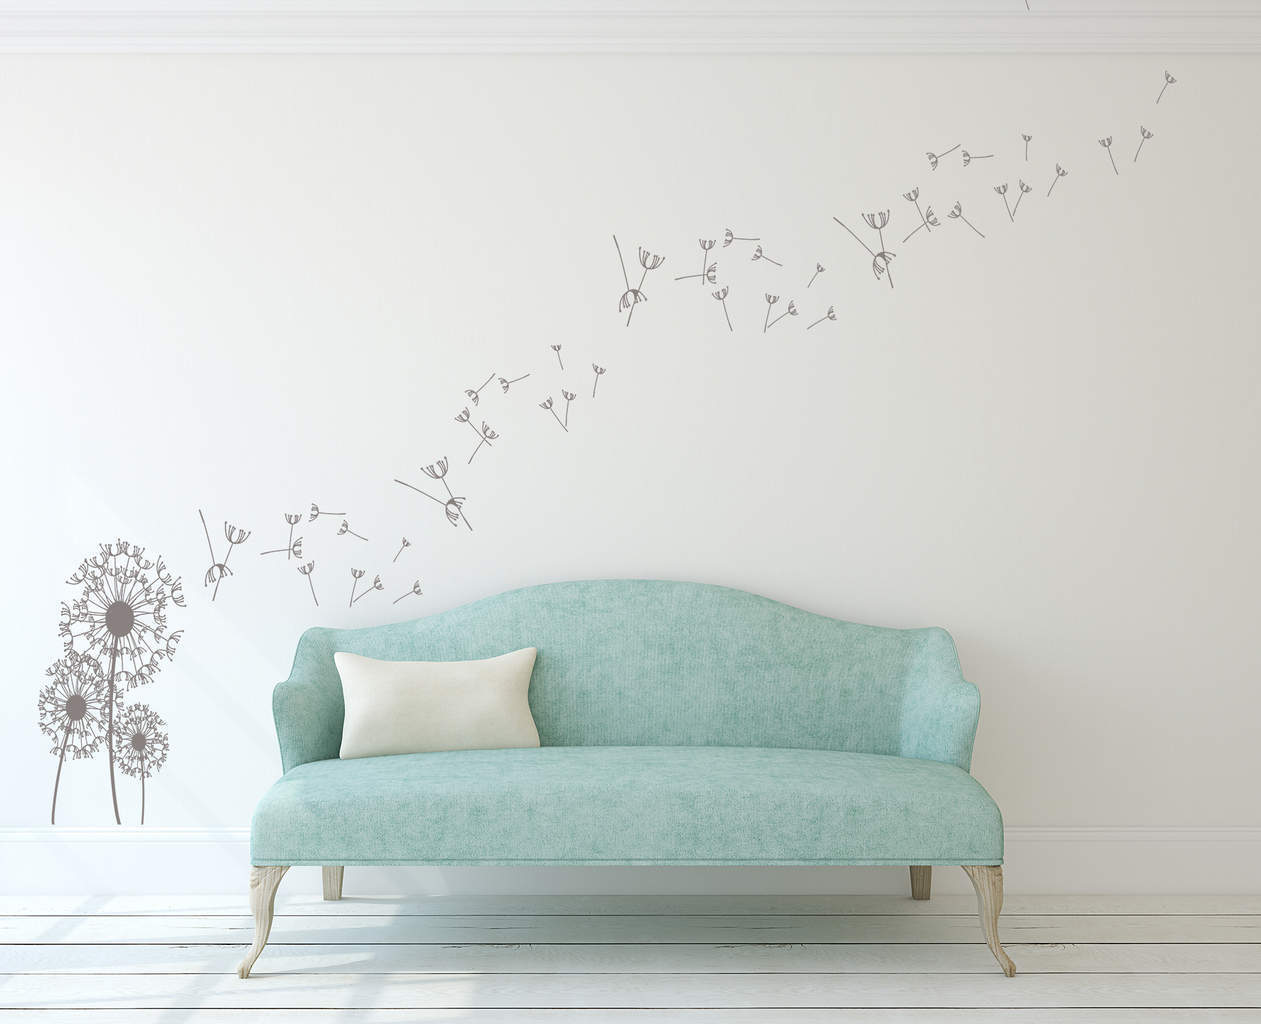 Dandelion Wall Art Decal Part 56